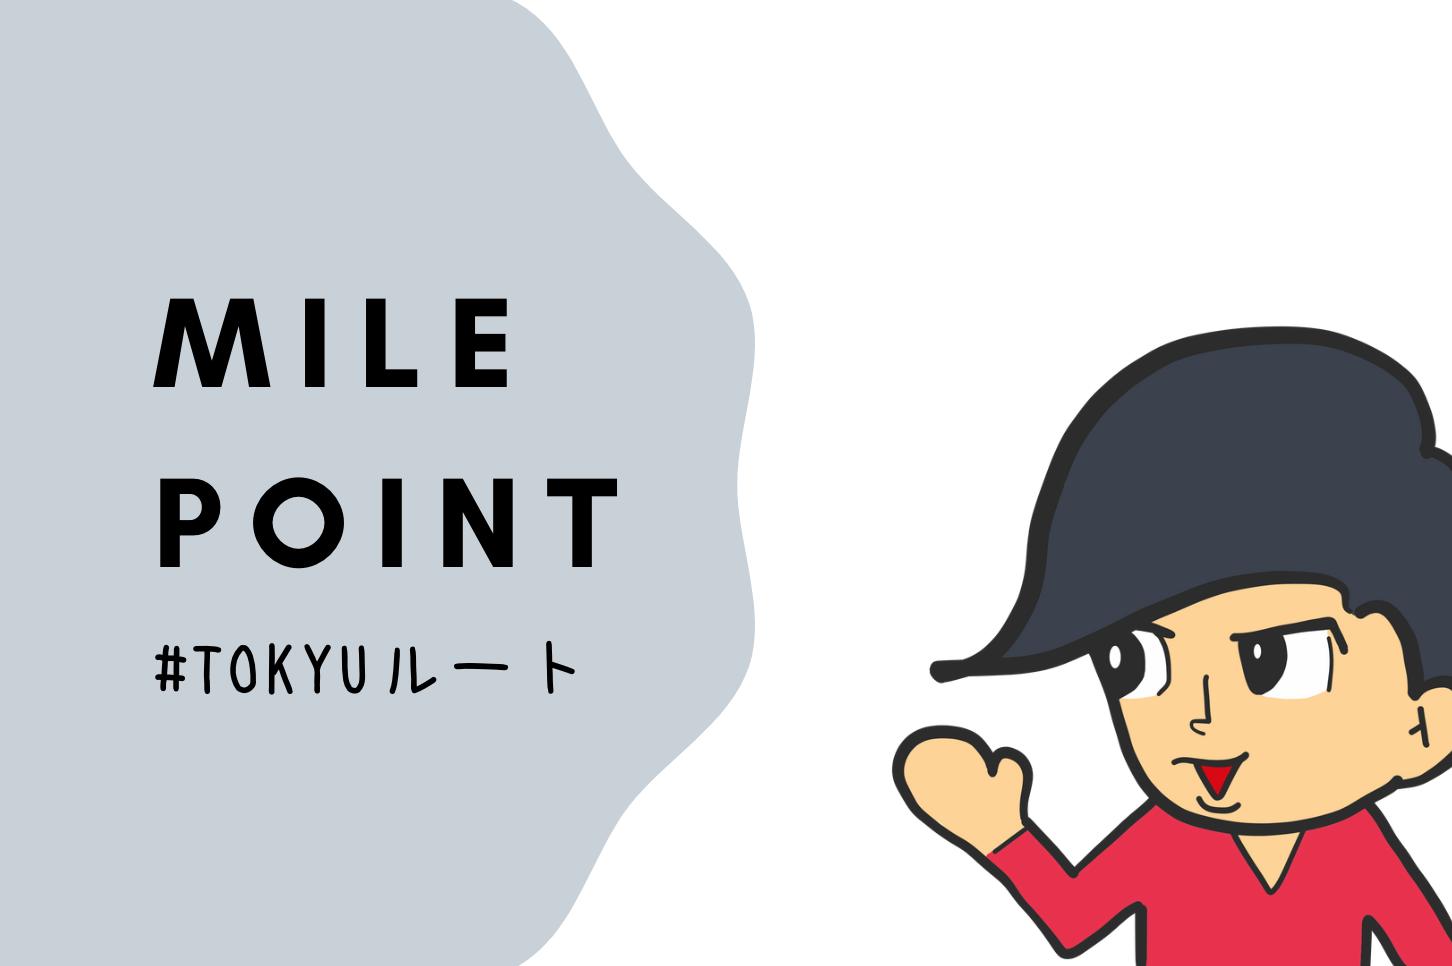 【2019/12】TOKYUルートでANAマイル交換方法!図解解説も